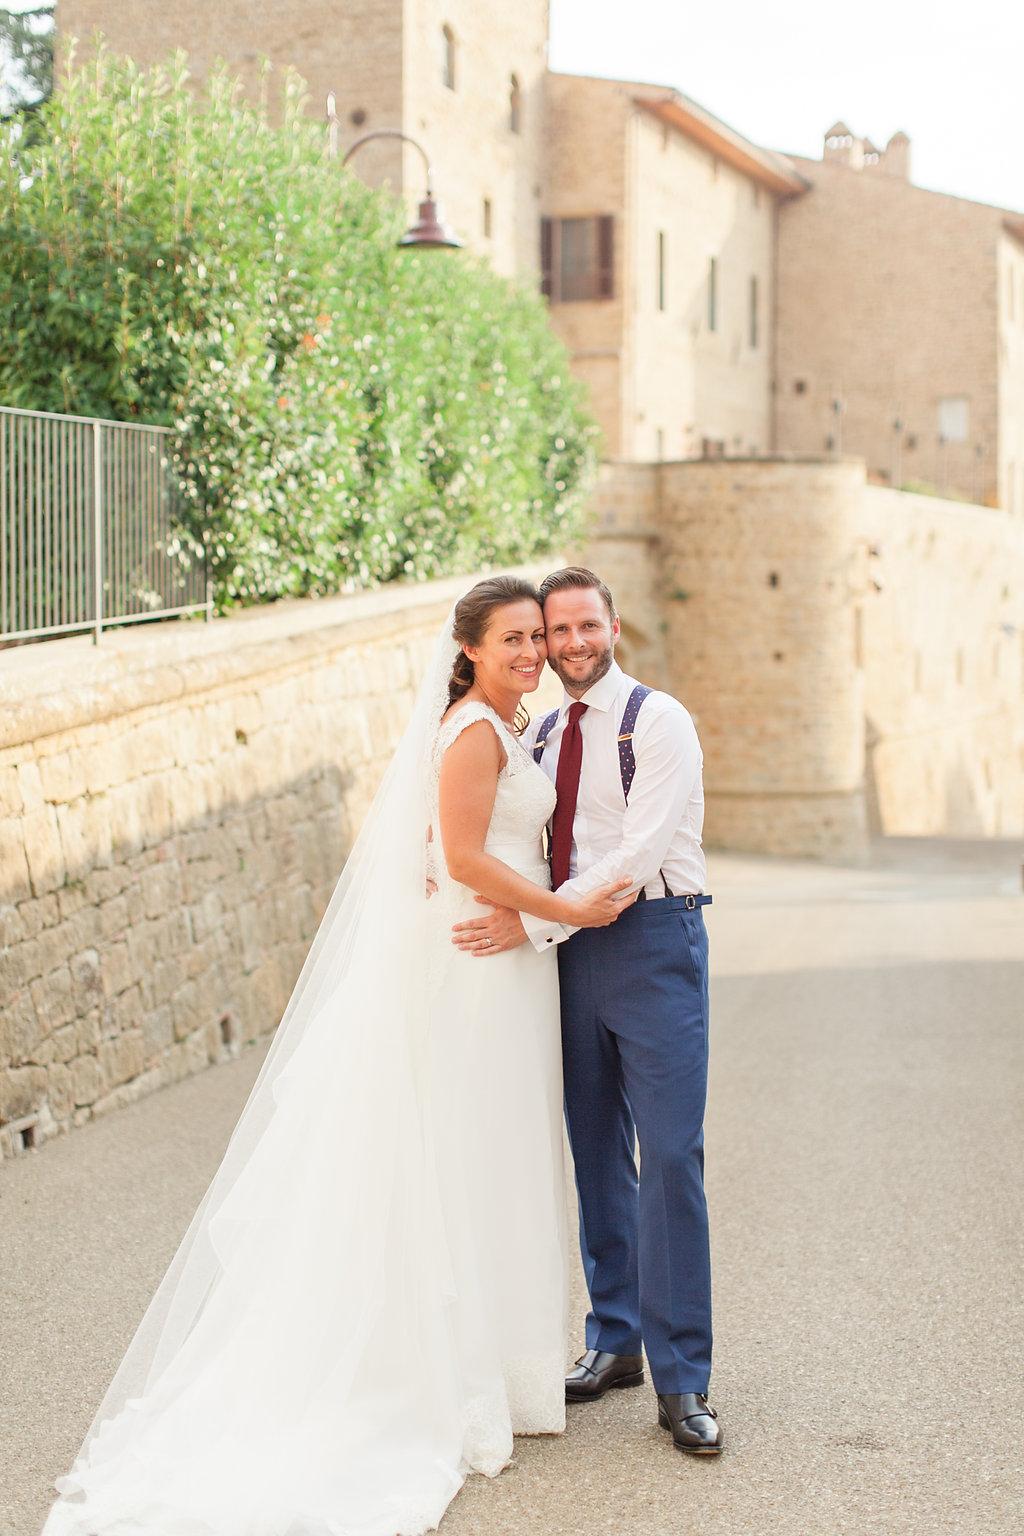 castelfalfi-tuscany-wedding-photographer-roberta-facchini-356